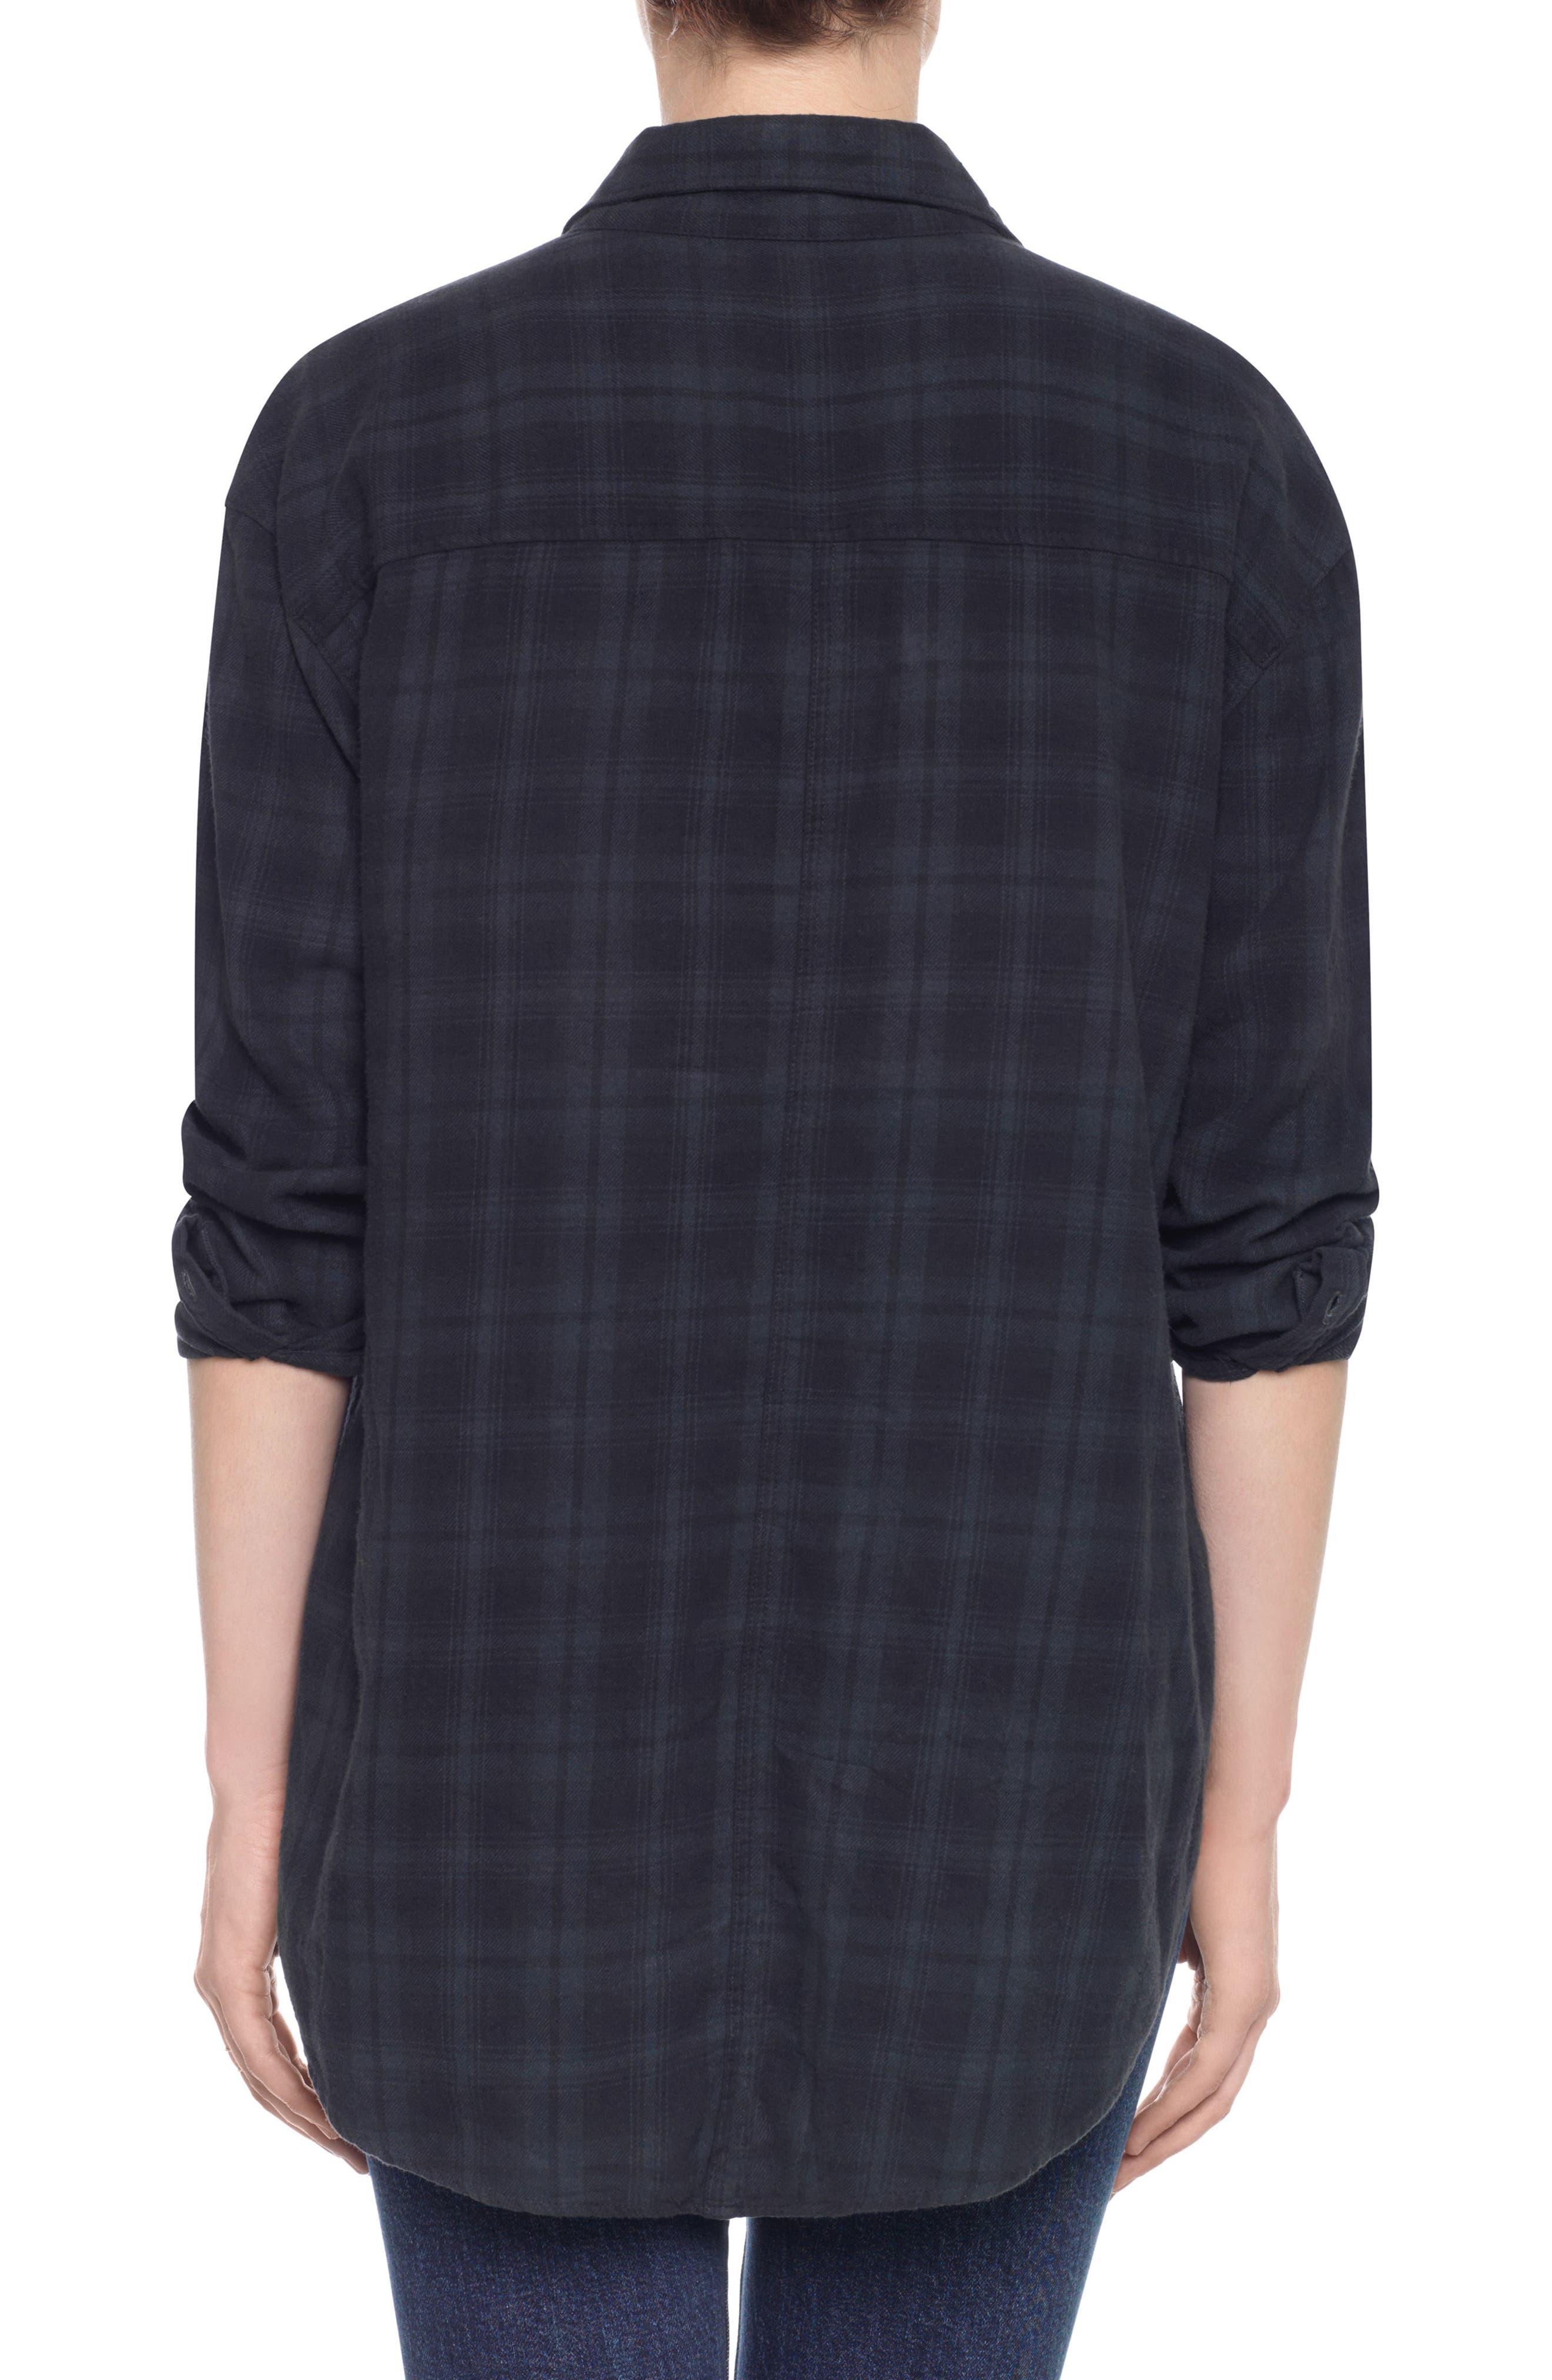 Alternate Image 2  - Taylor Hill x Joe's Boyfriend Flannel Shirt